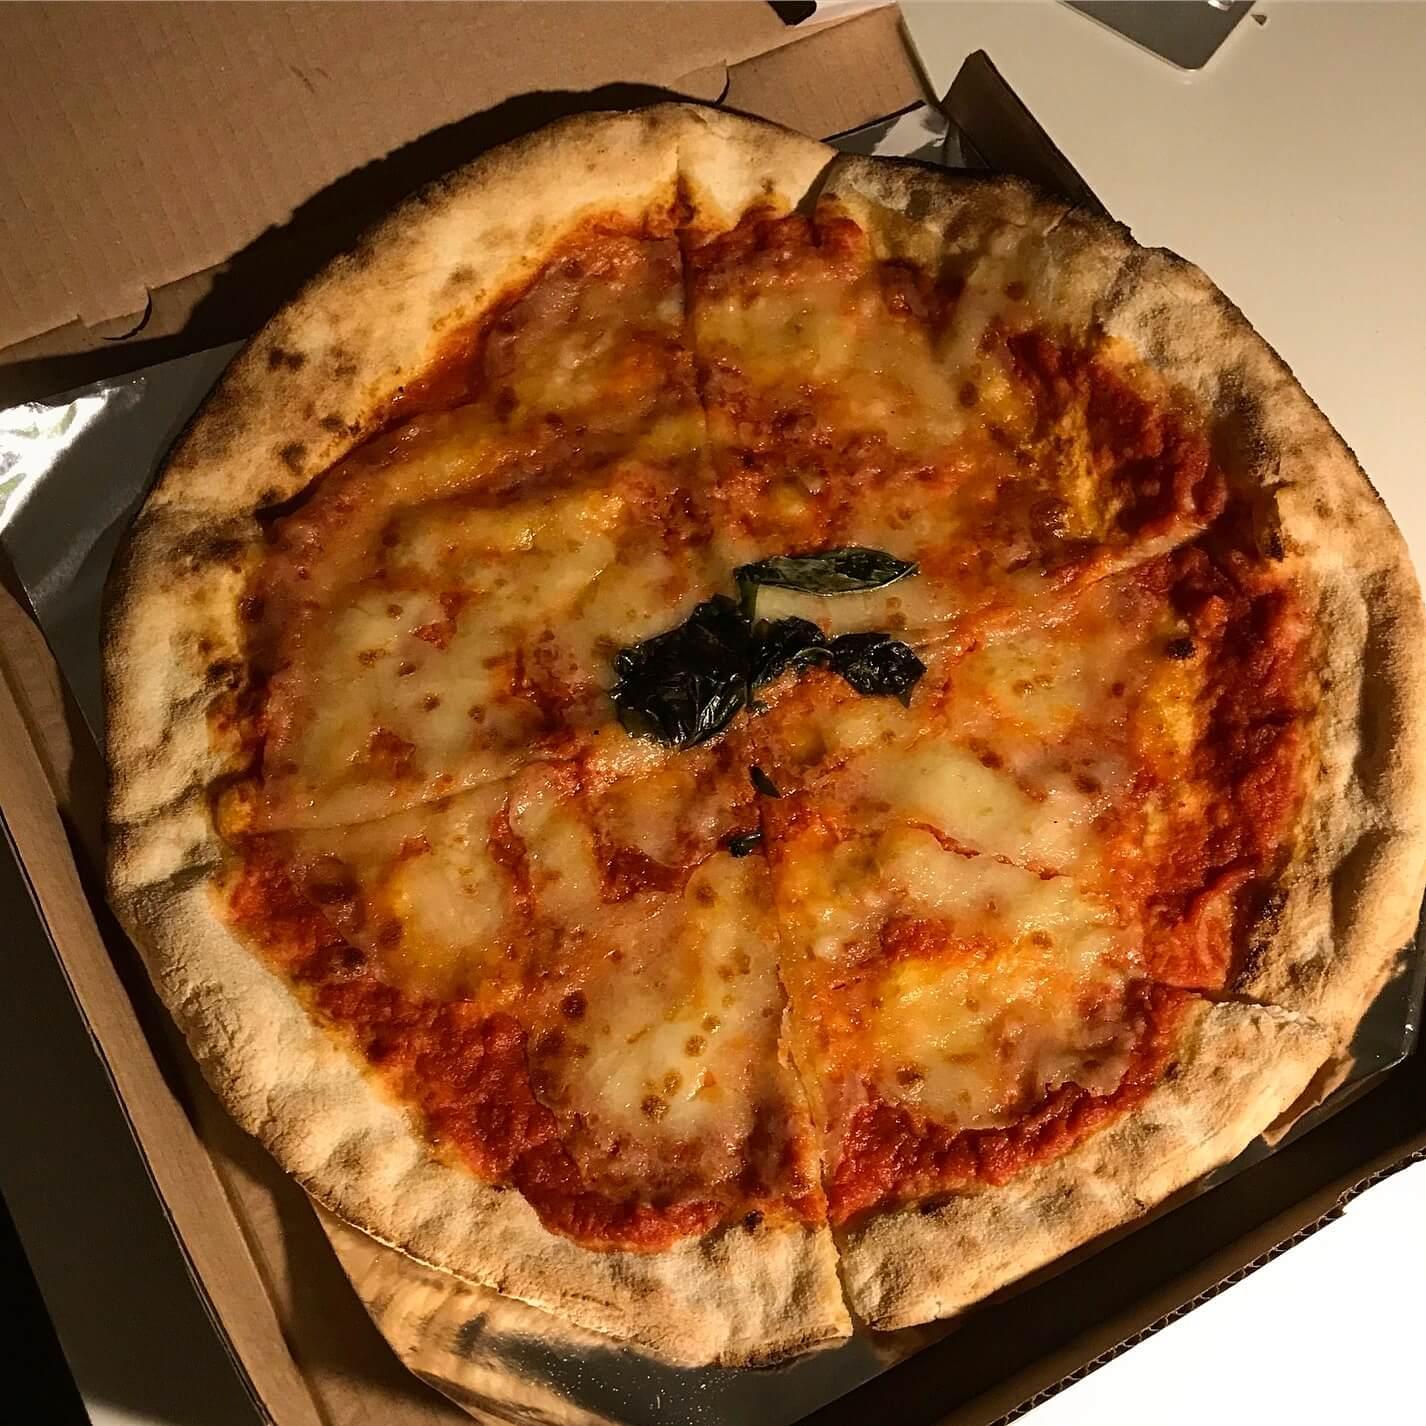 Pomodoro dowozi pizze